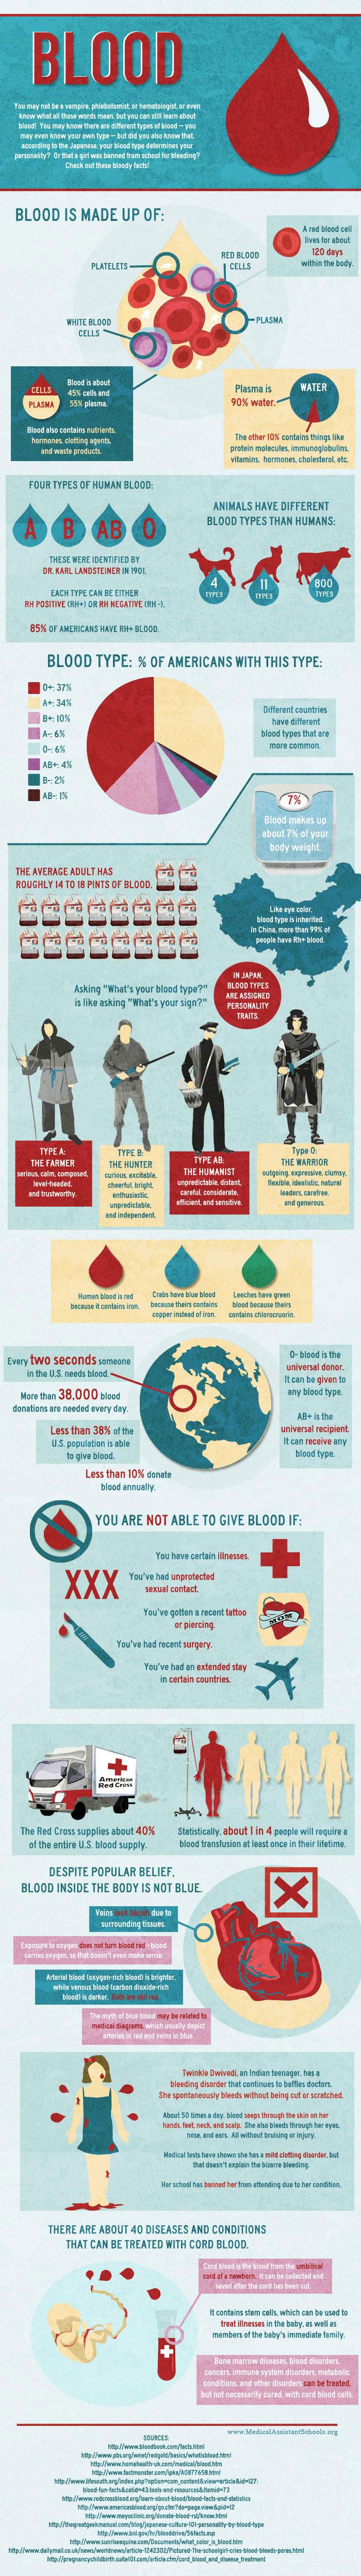 Medical Assistant Schools for Douchebags - infographic made by Douchebags for Douchebags